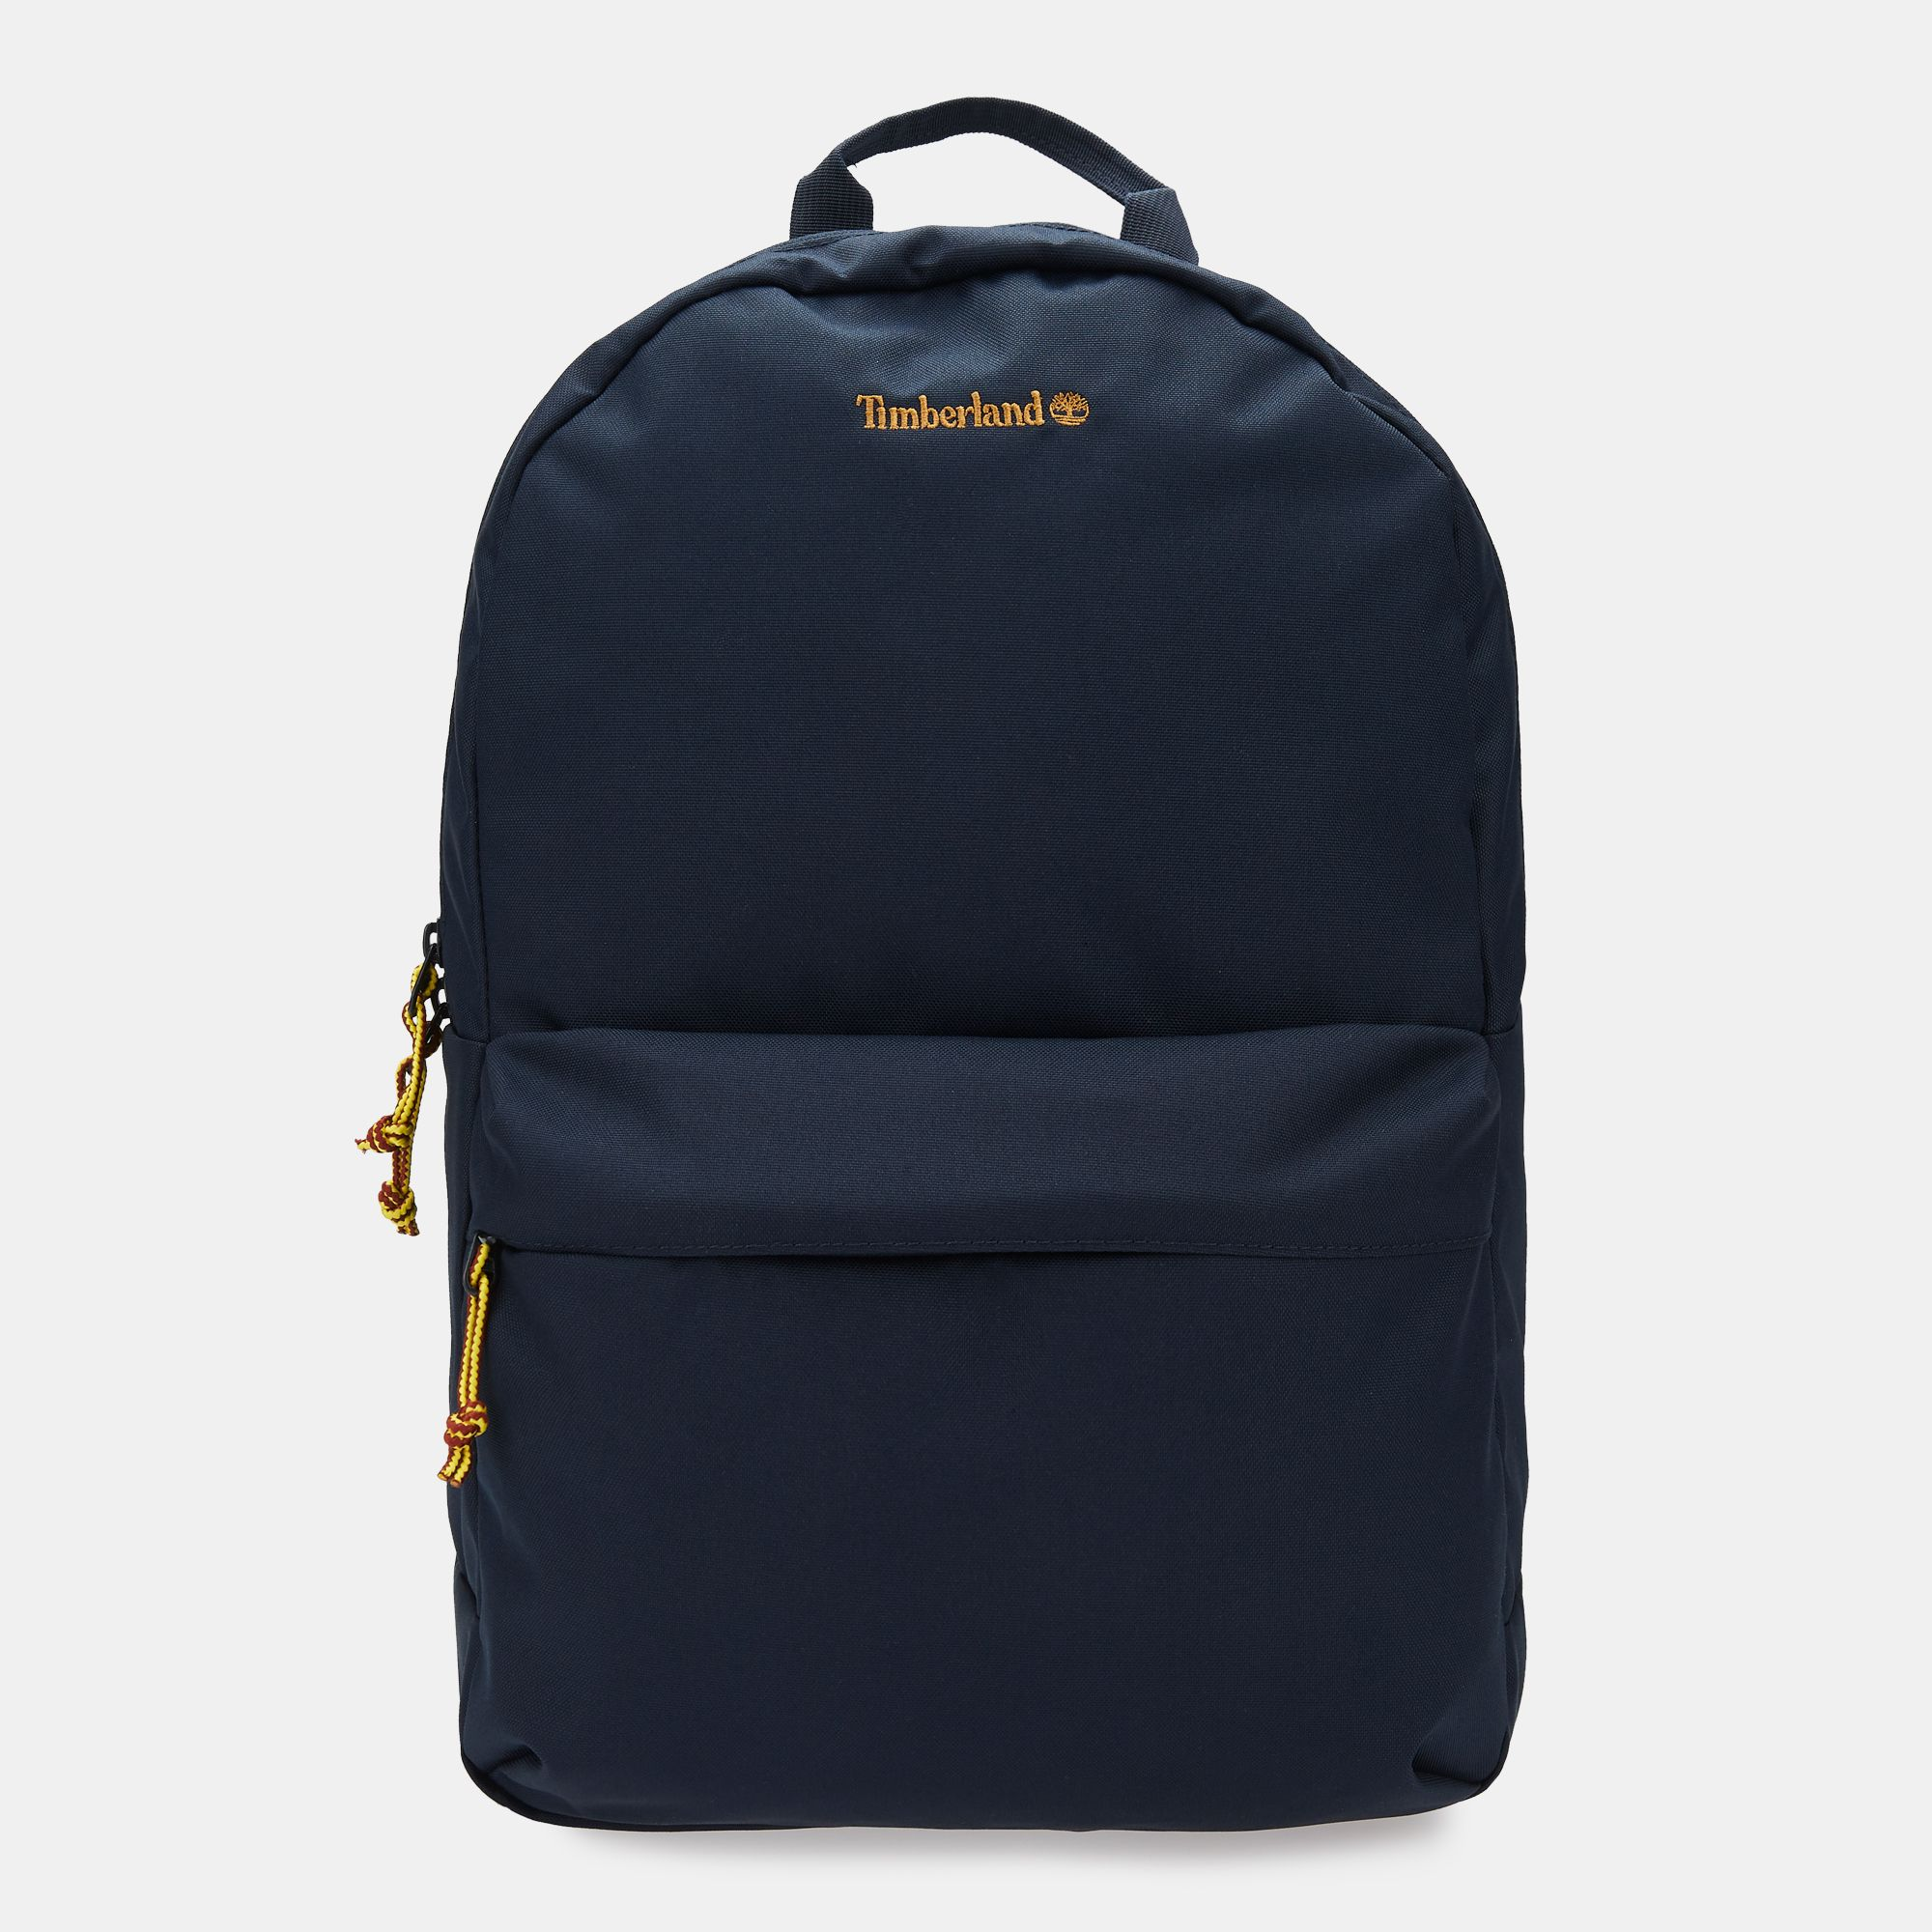 783fa6c10 Timberland Classic Backpack | Backpacks and Rucksacks | Bags ...